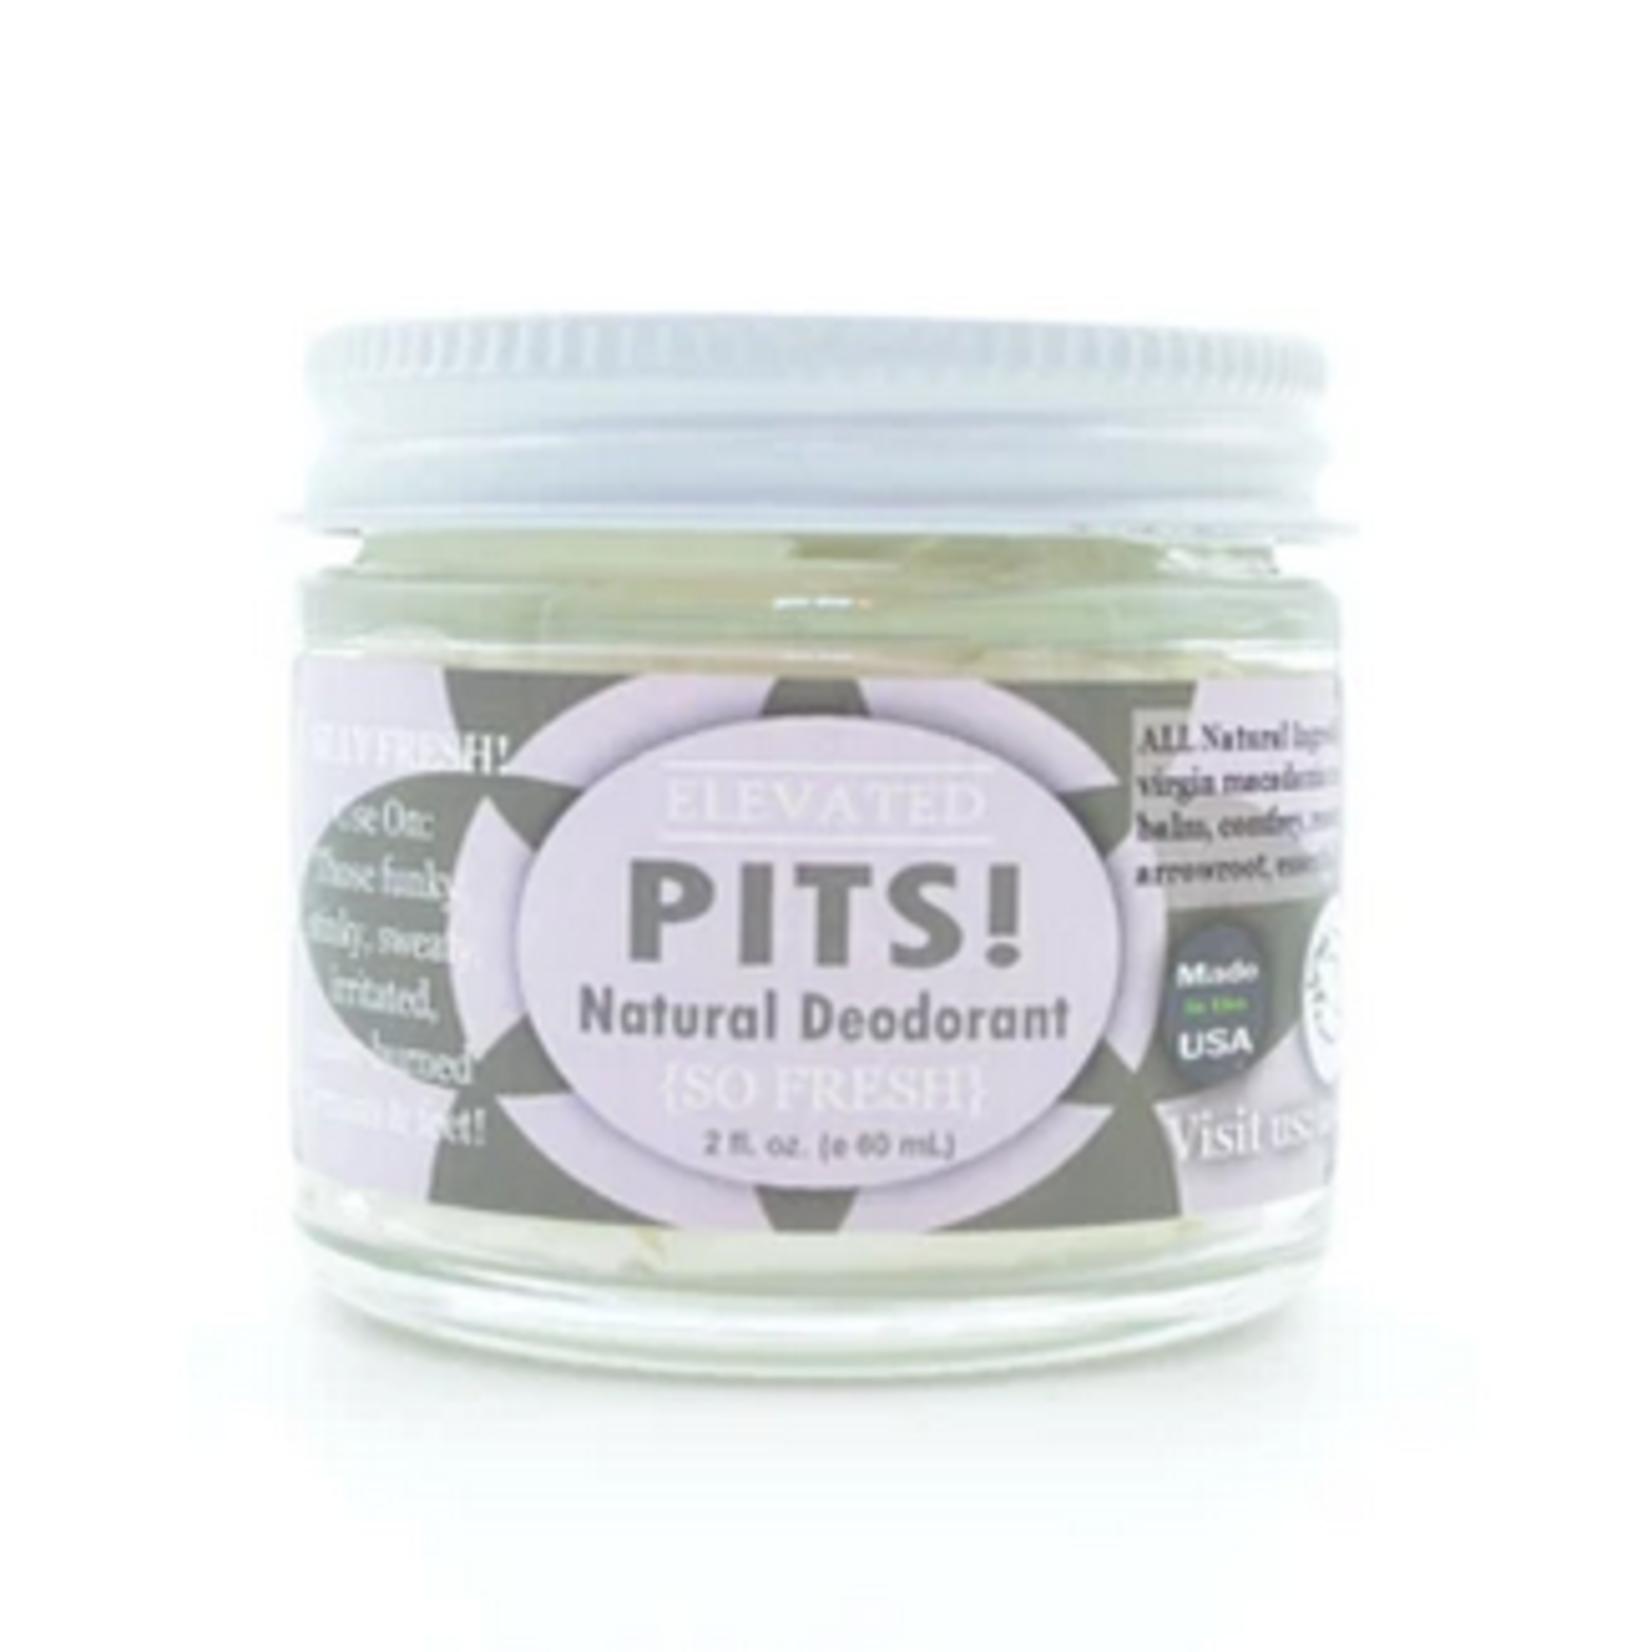 Elevated So Fresh Pits! Deodorant